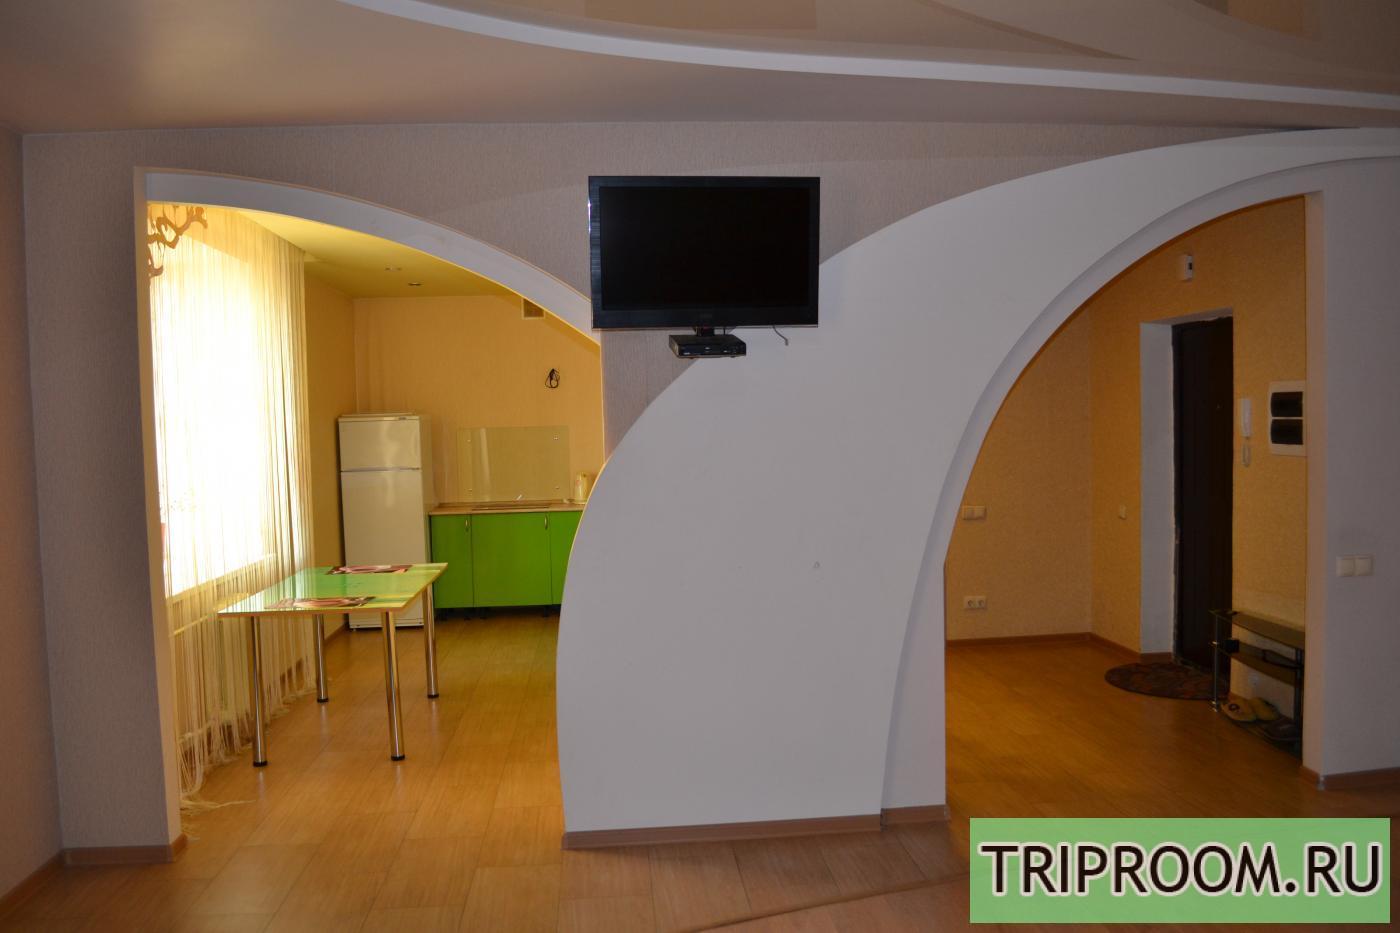 1-комнатная квартира посуточно (вариант № 591), ул. Революции проспект, фото № 2